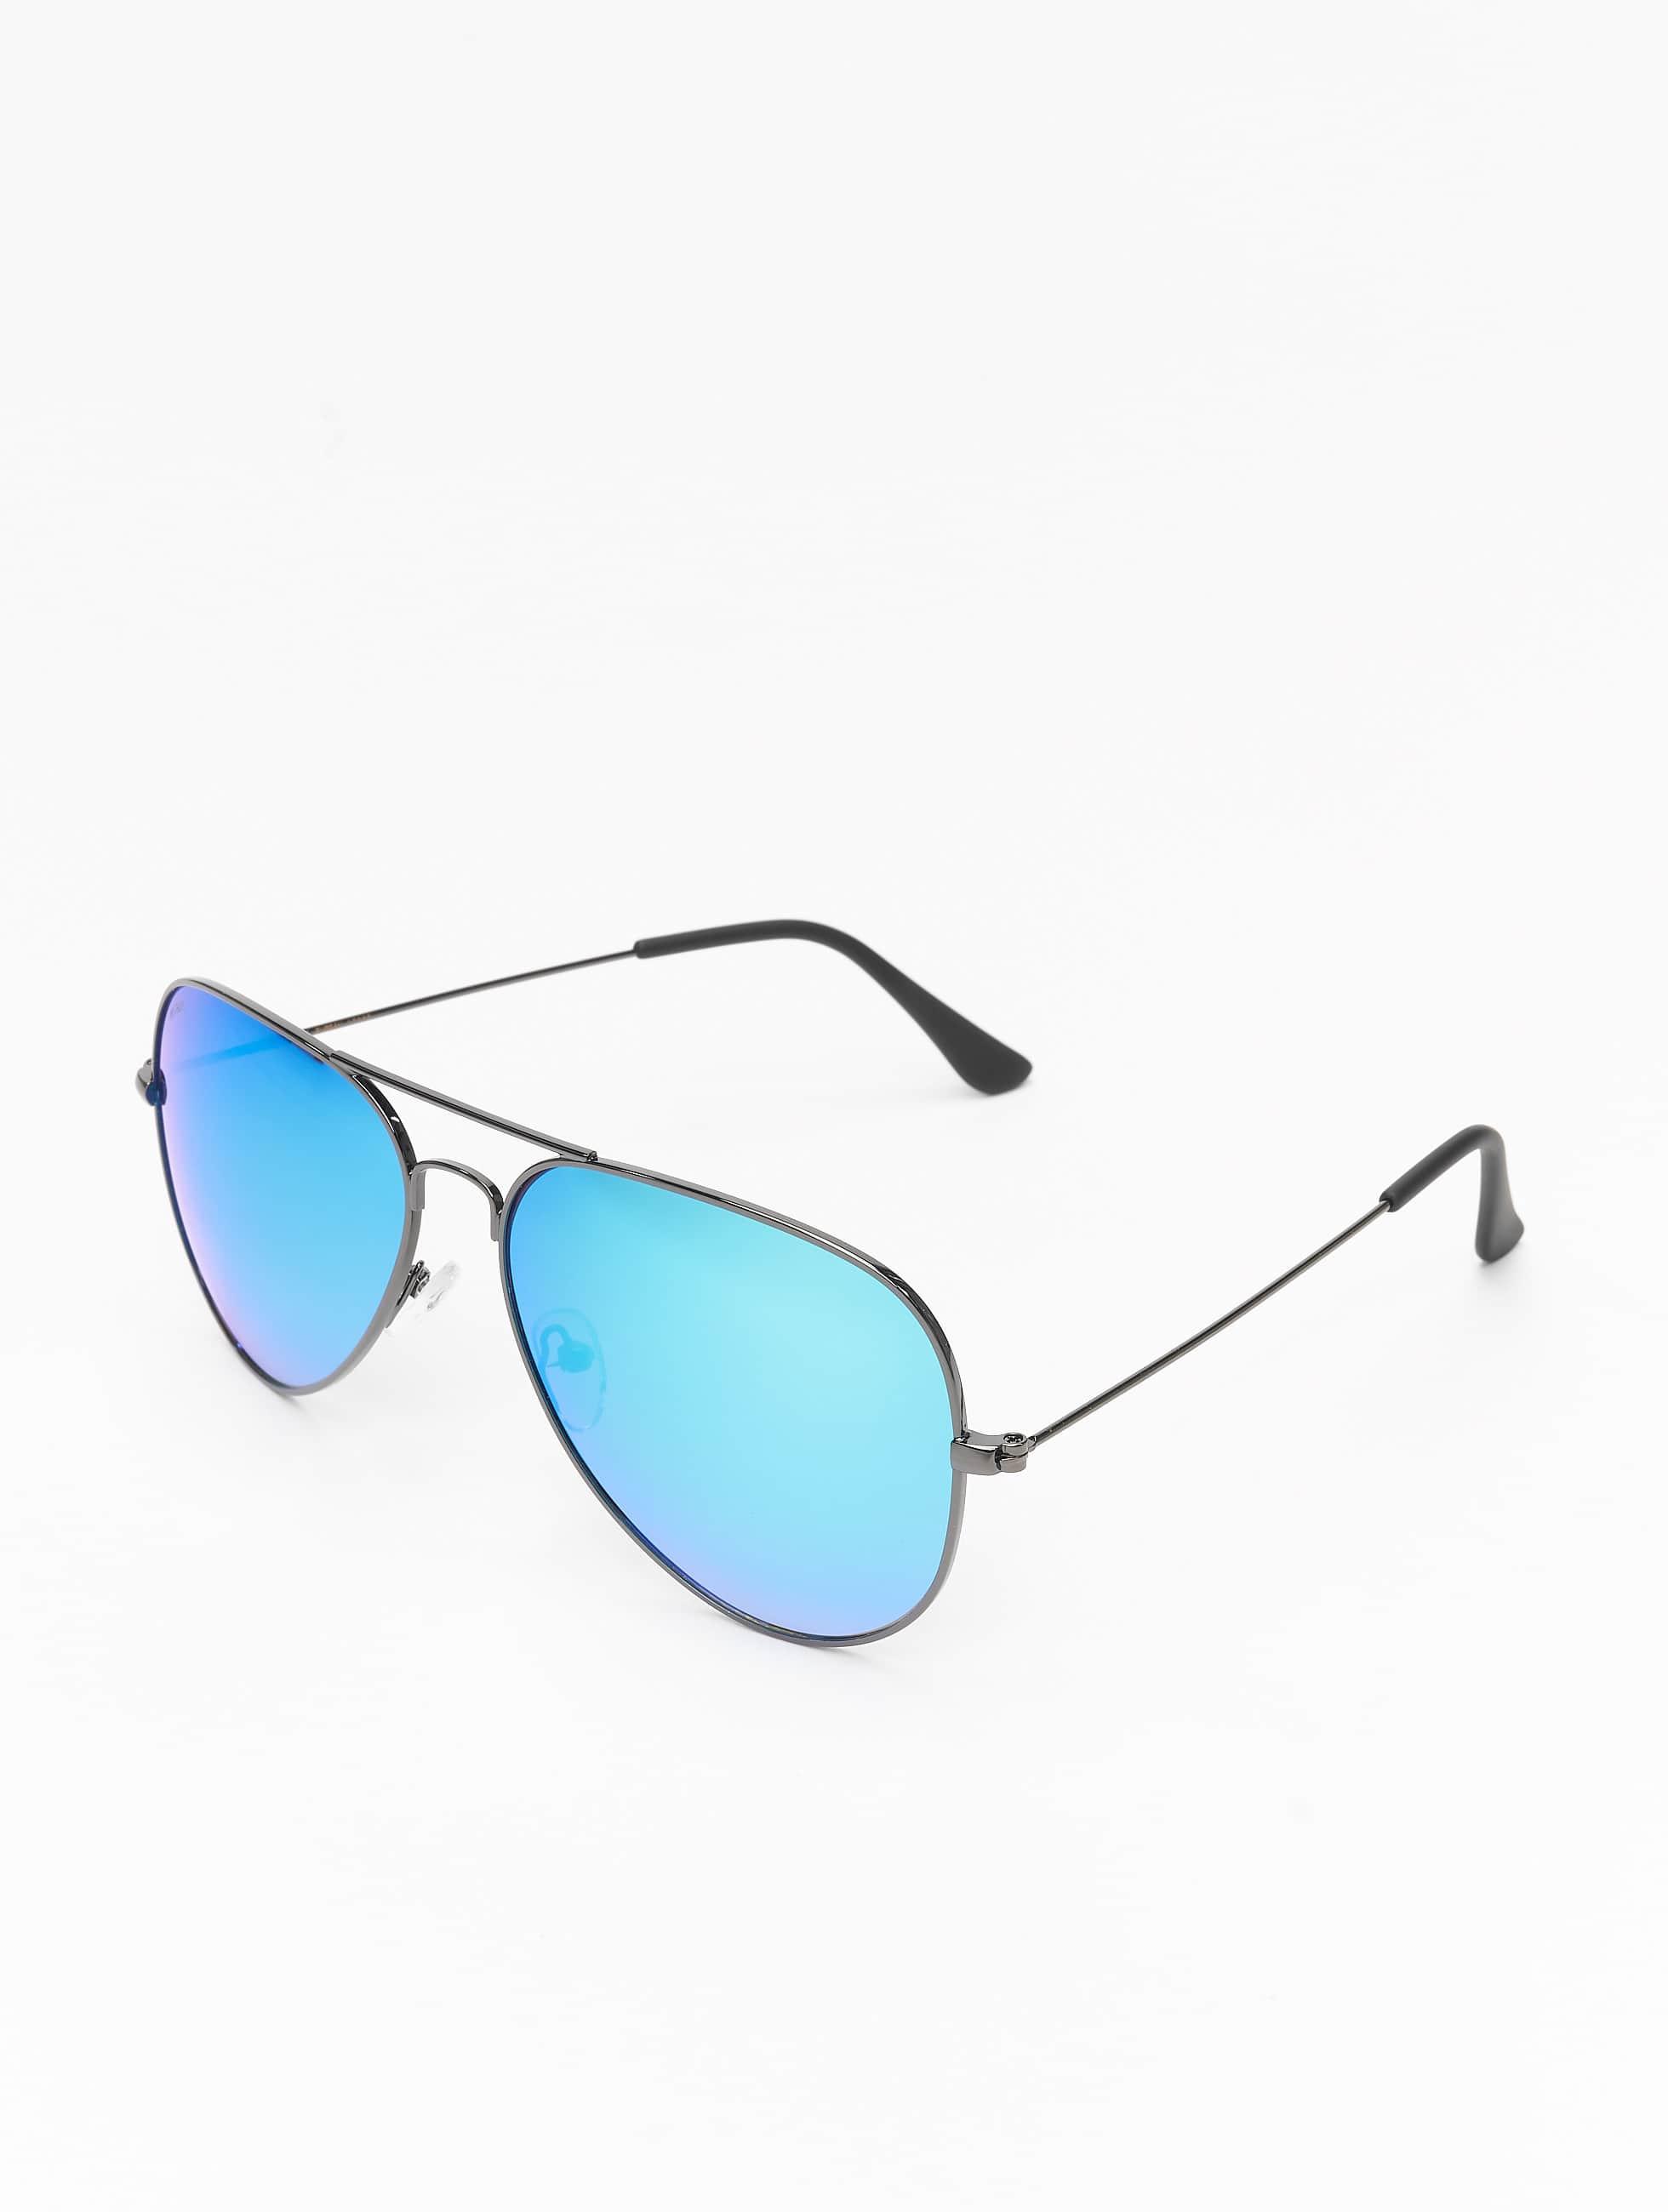 MSTRDS Sonnenbrille Pure AV Polarized Mirror silberfarben